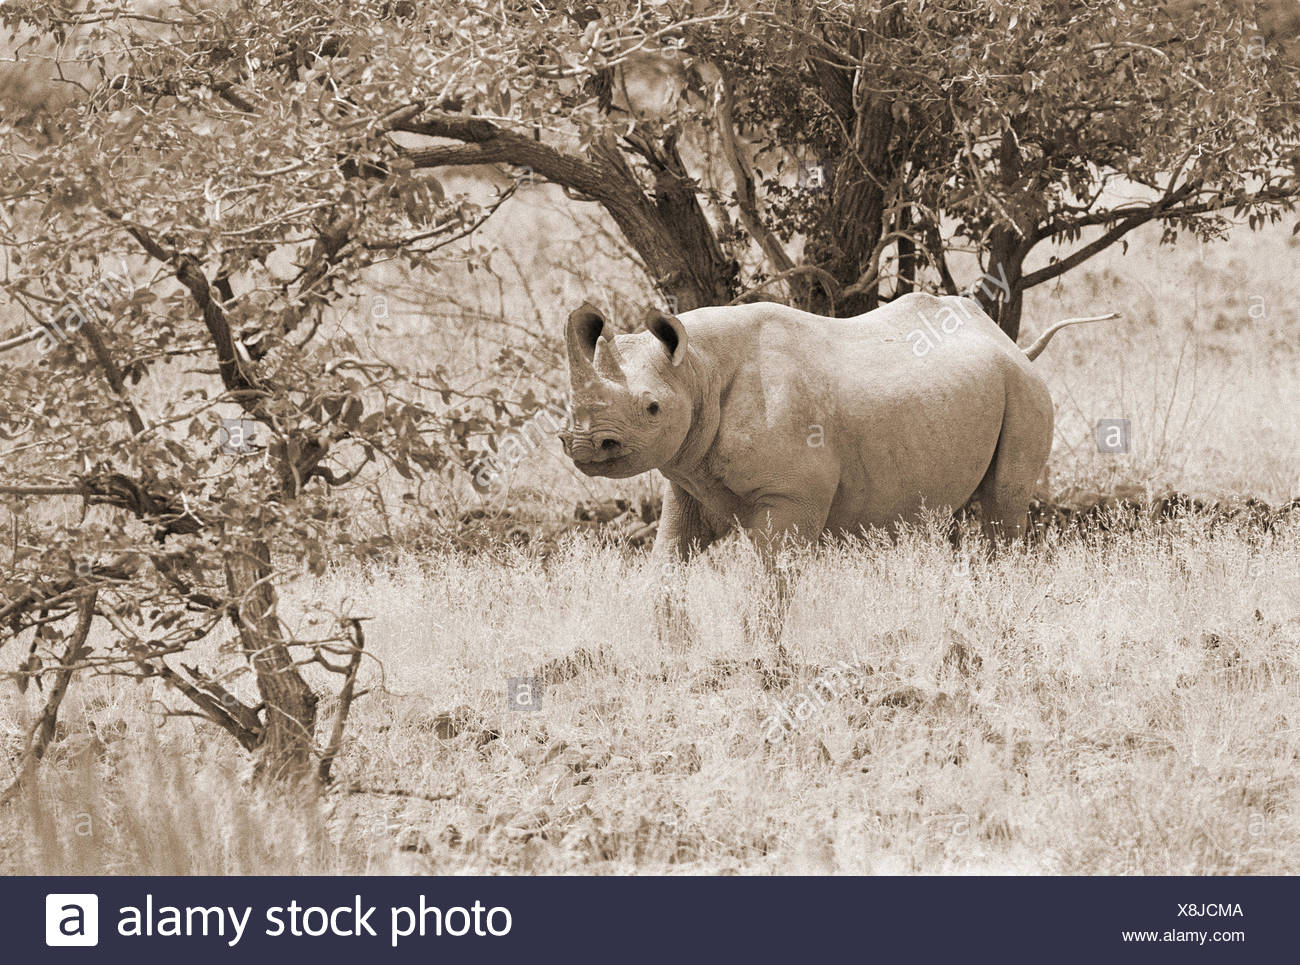 Rhino in long grass under tree, Africa - Stock Image